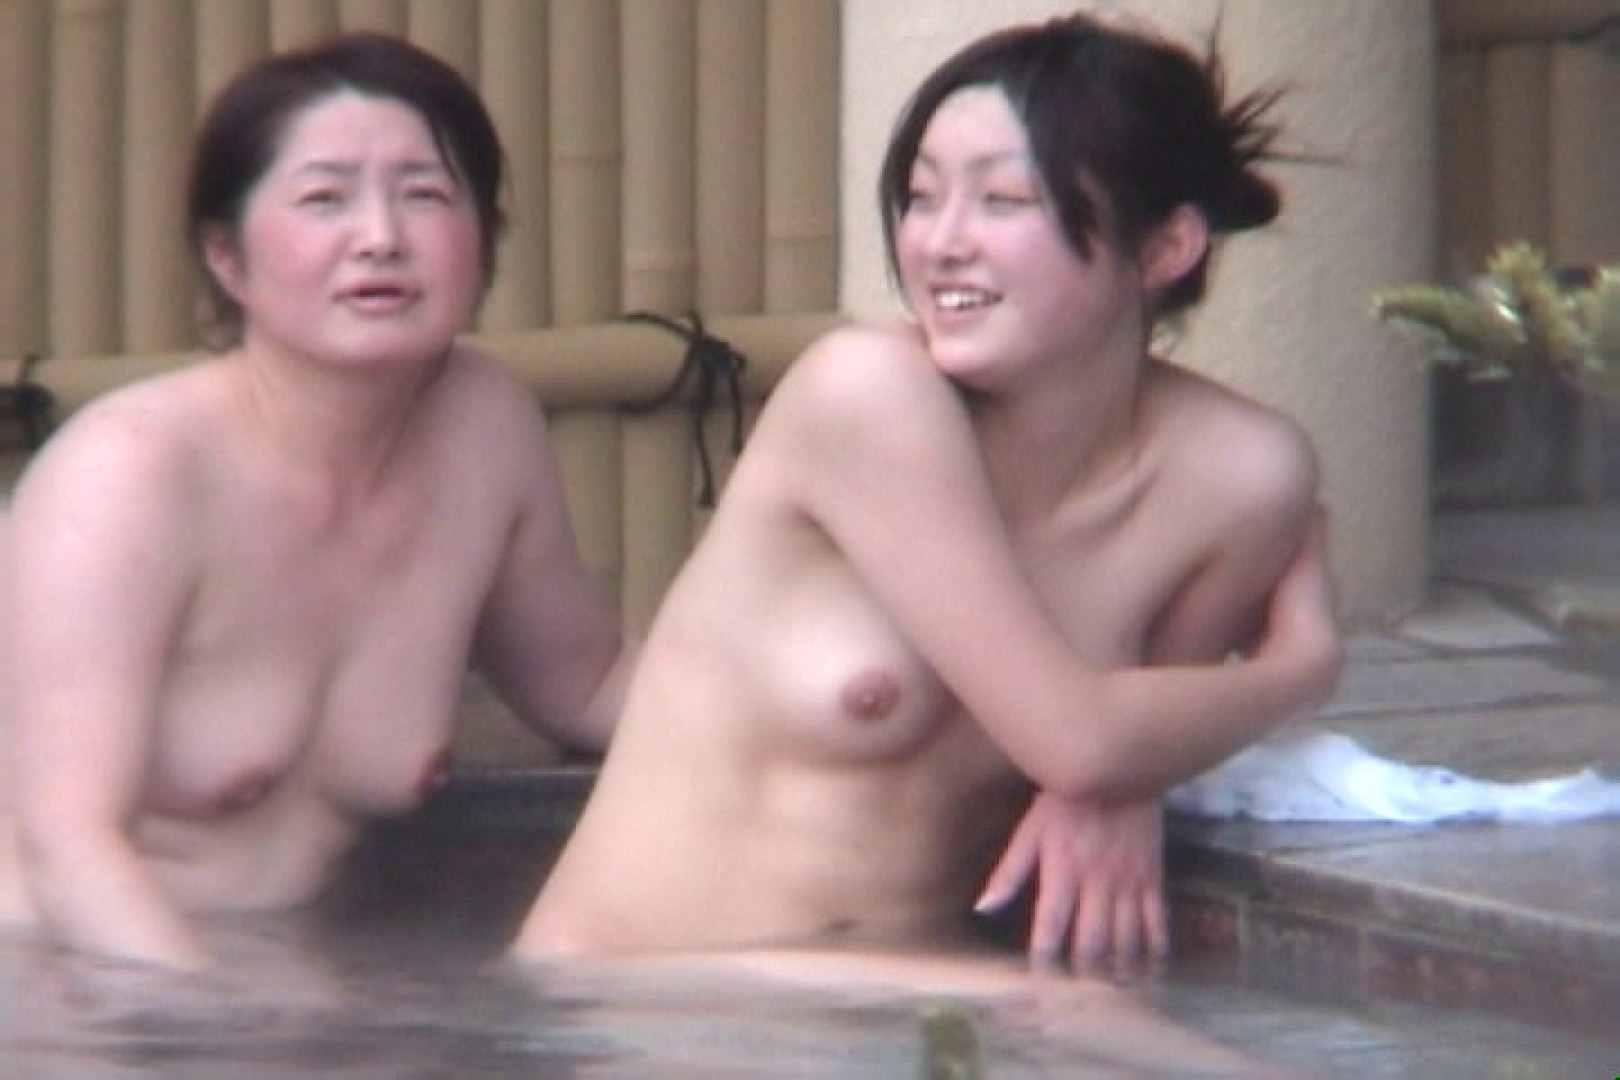 Aquaな露天風呂Vol.44【VIP限定】 0 | 0  72連発 11